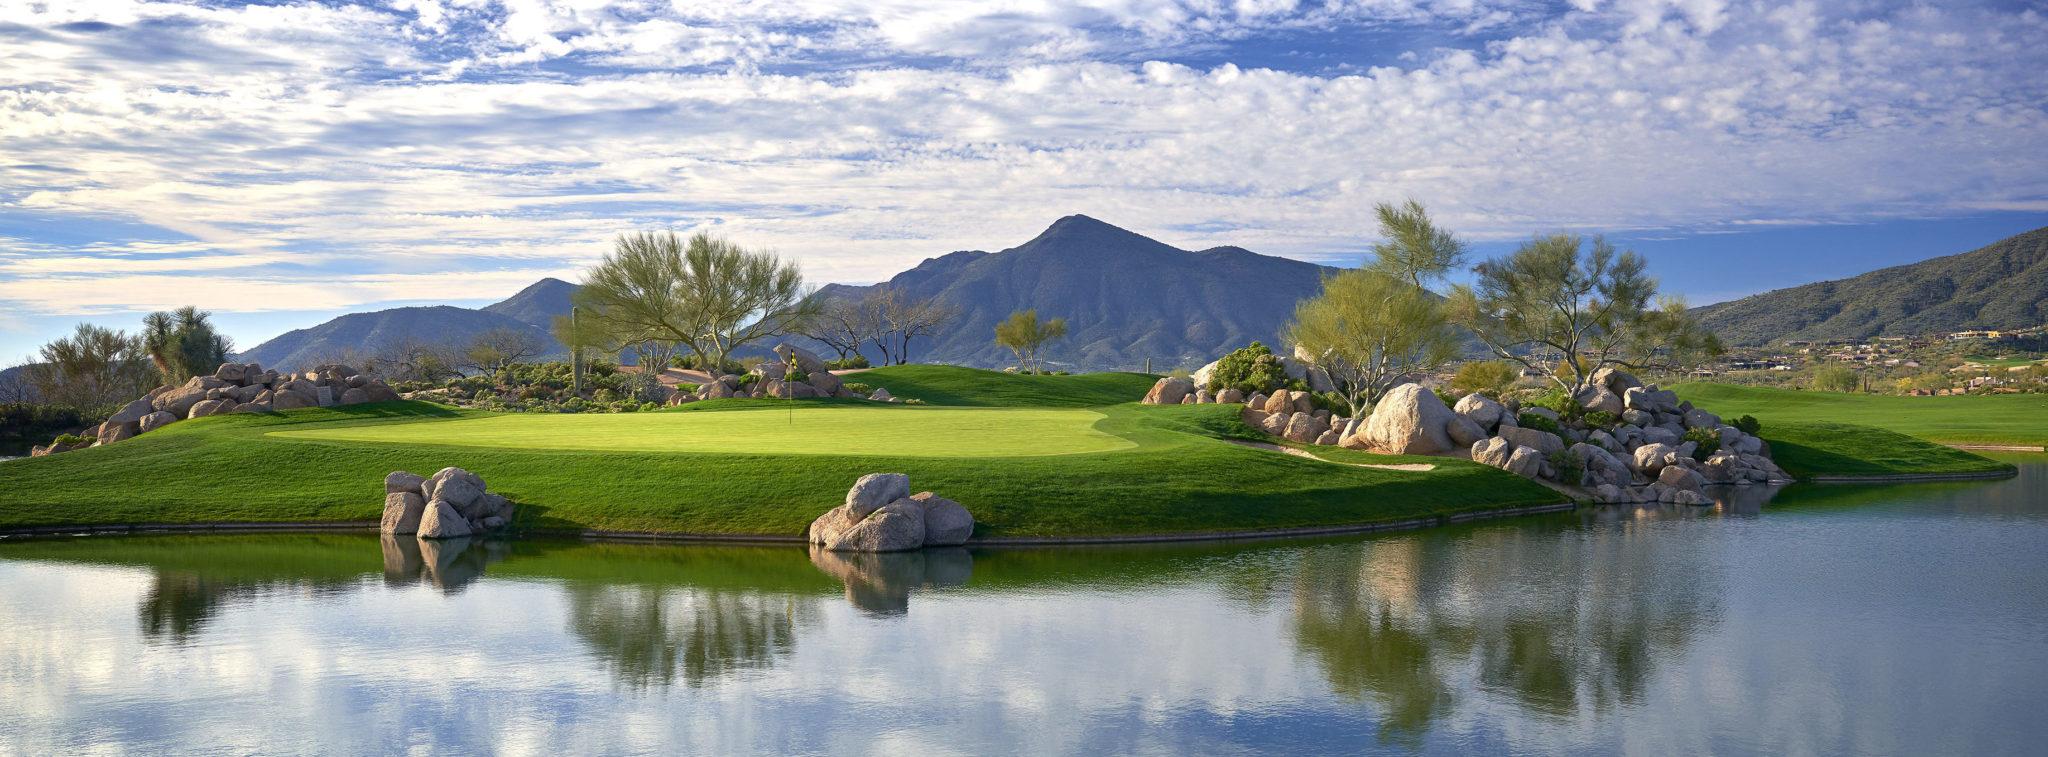 Desert_Mountain_Golf